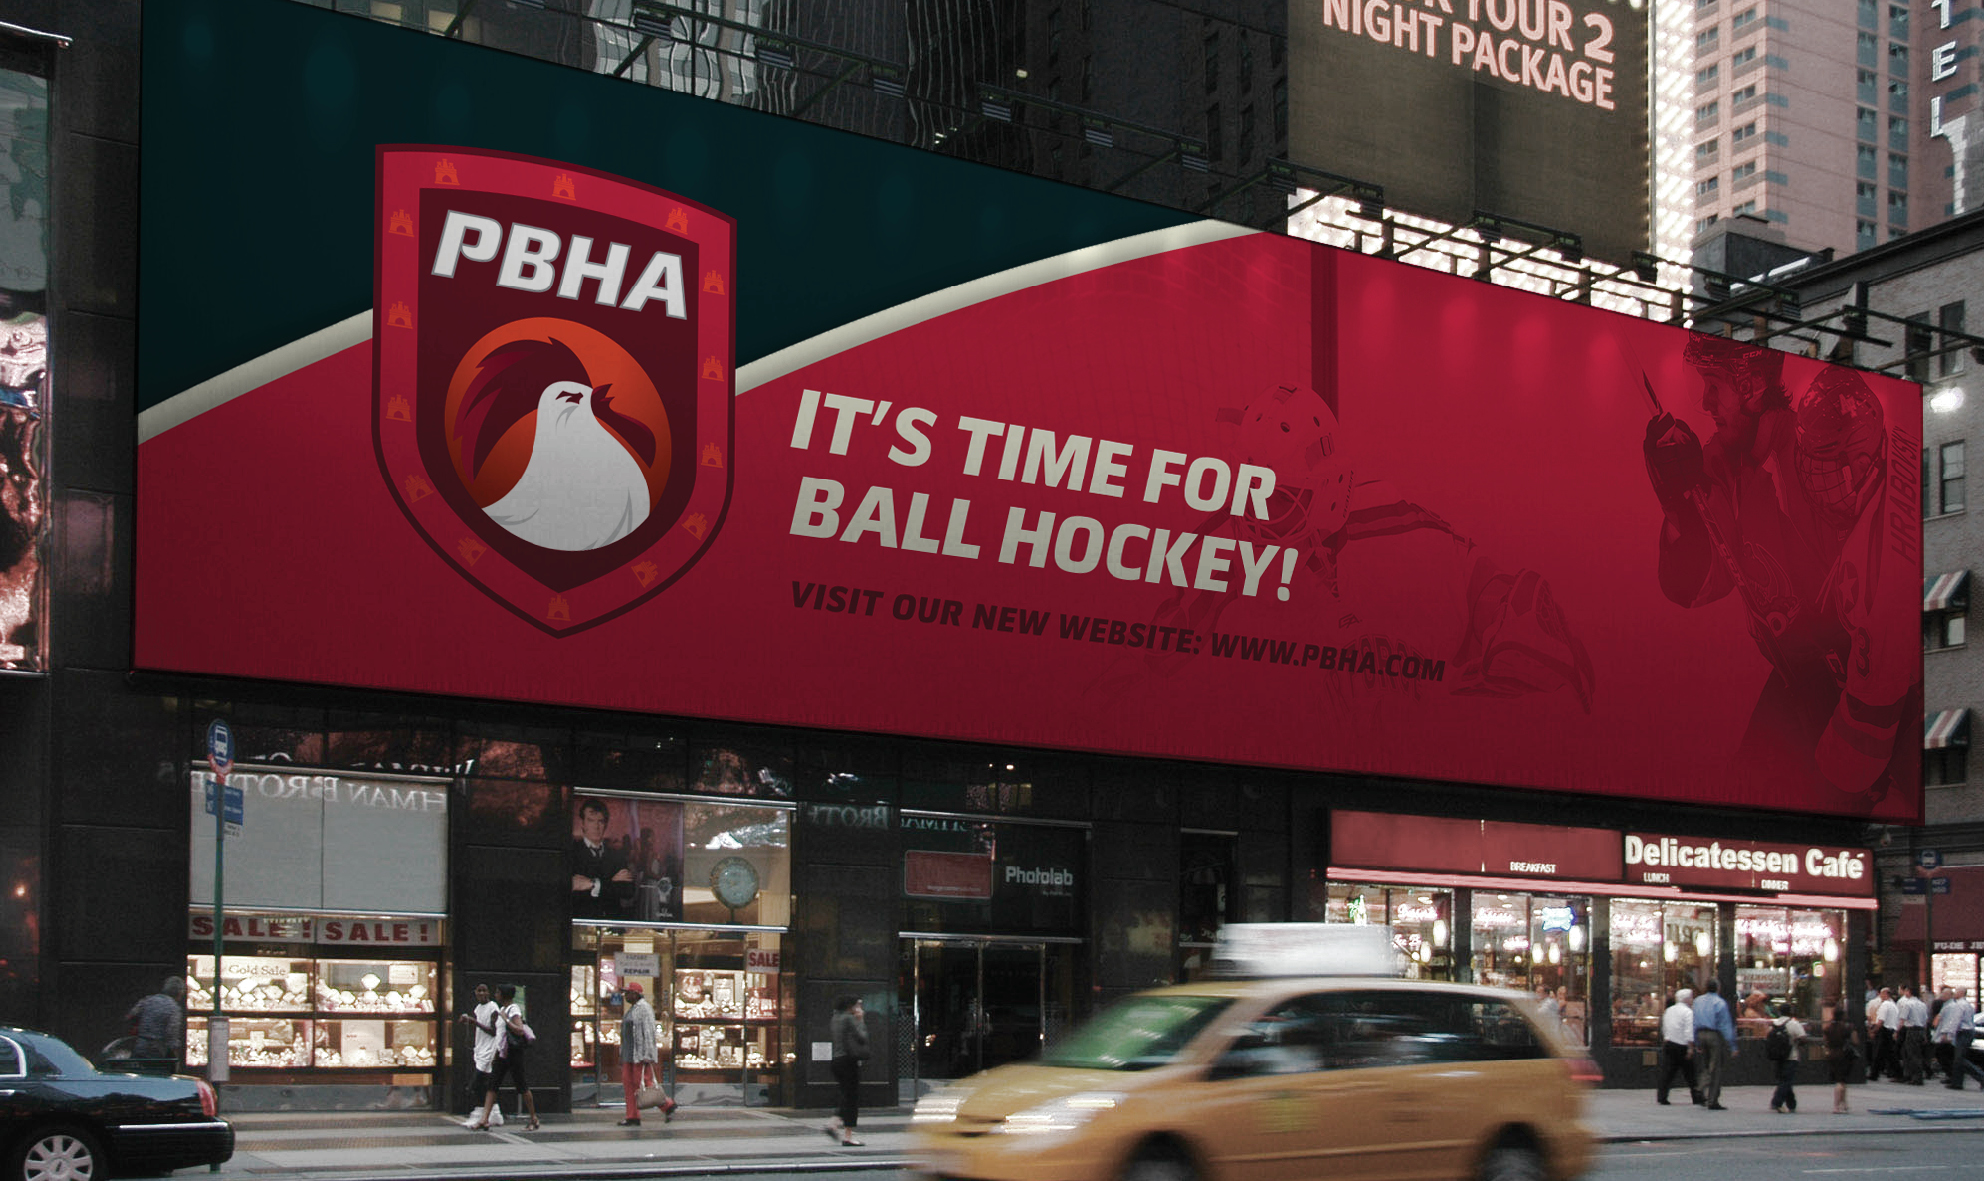 PBHA Brand Identity By Nacione33